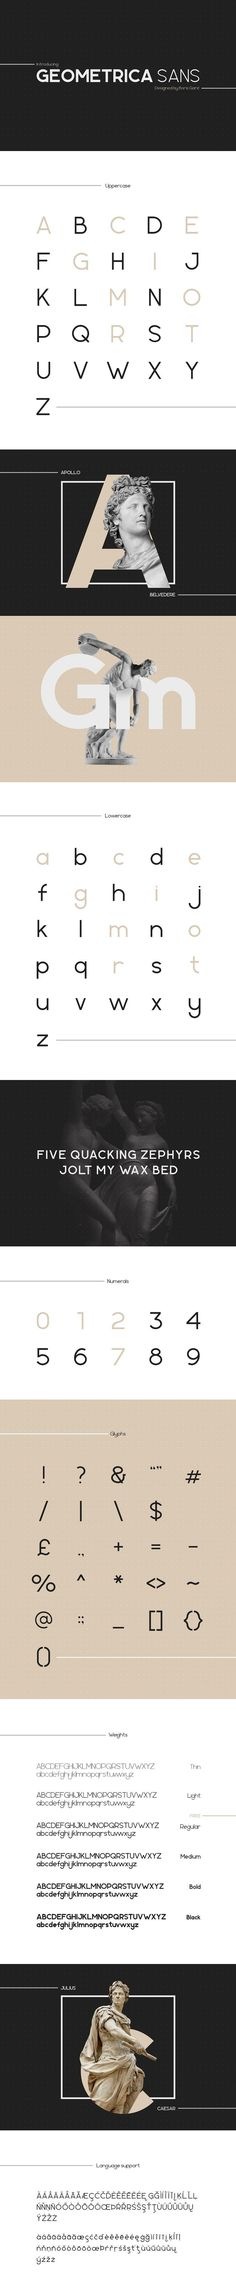 Geometrica Sans Free Typeface